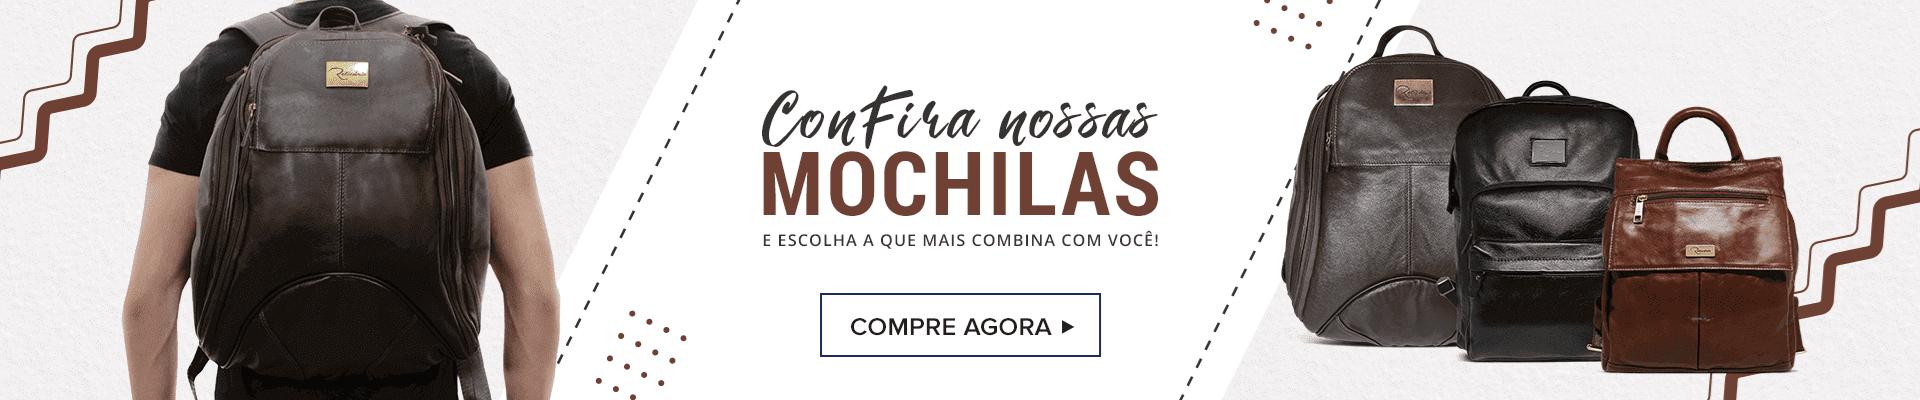 Banner Topo Três